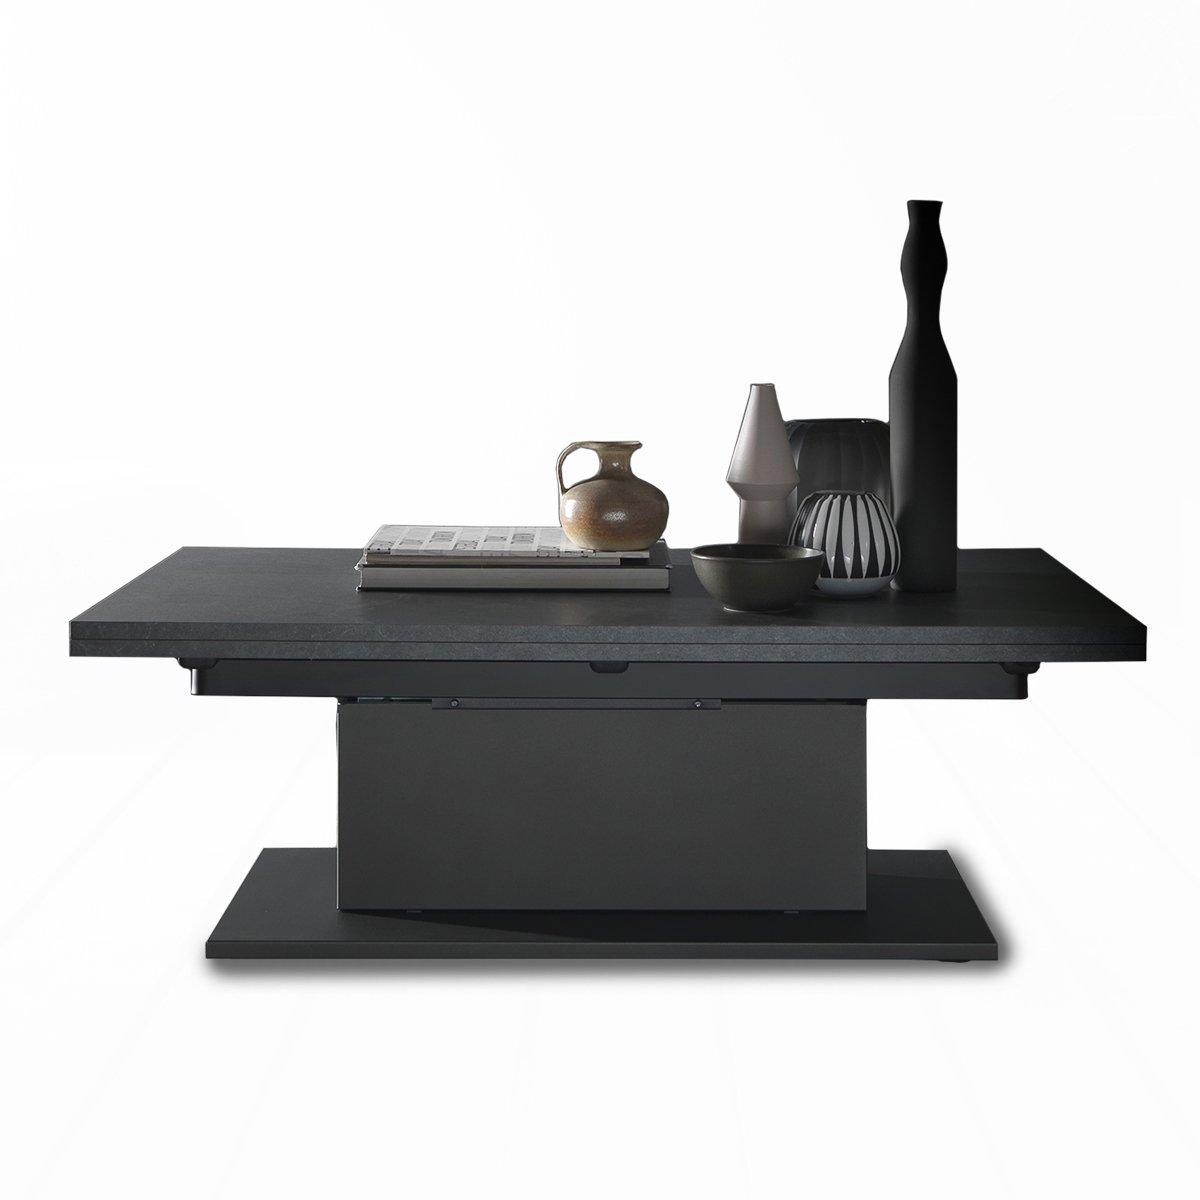 Table Basse Relevable Tasca